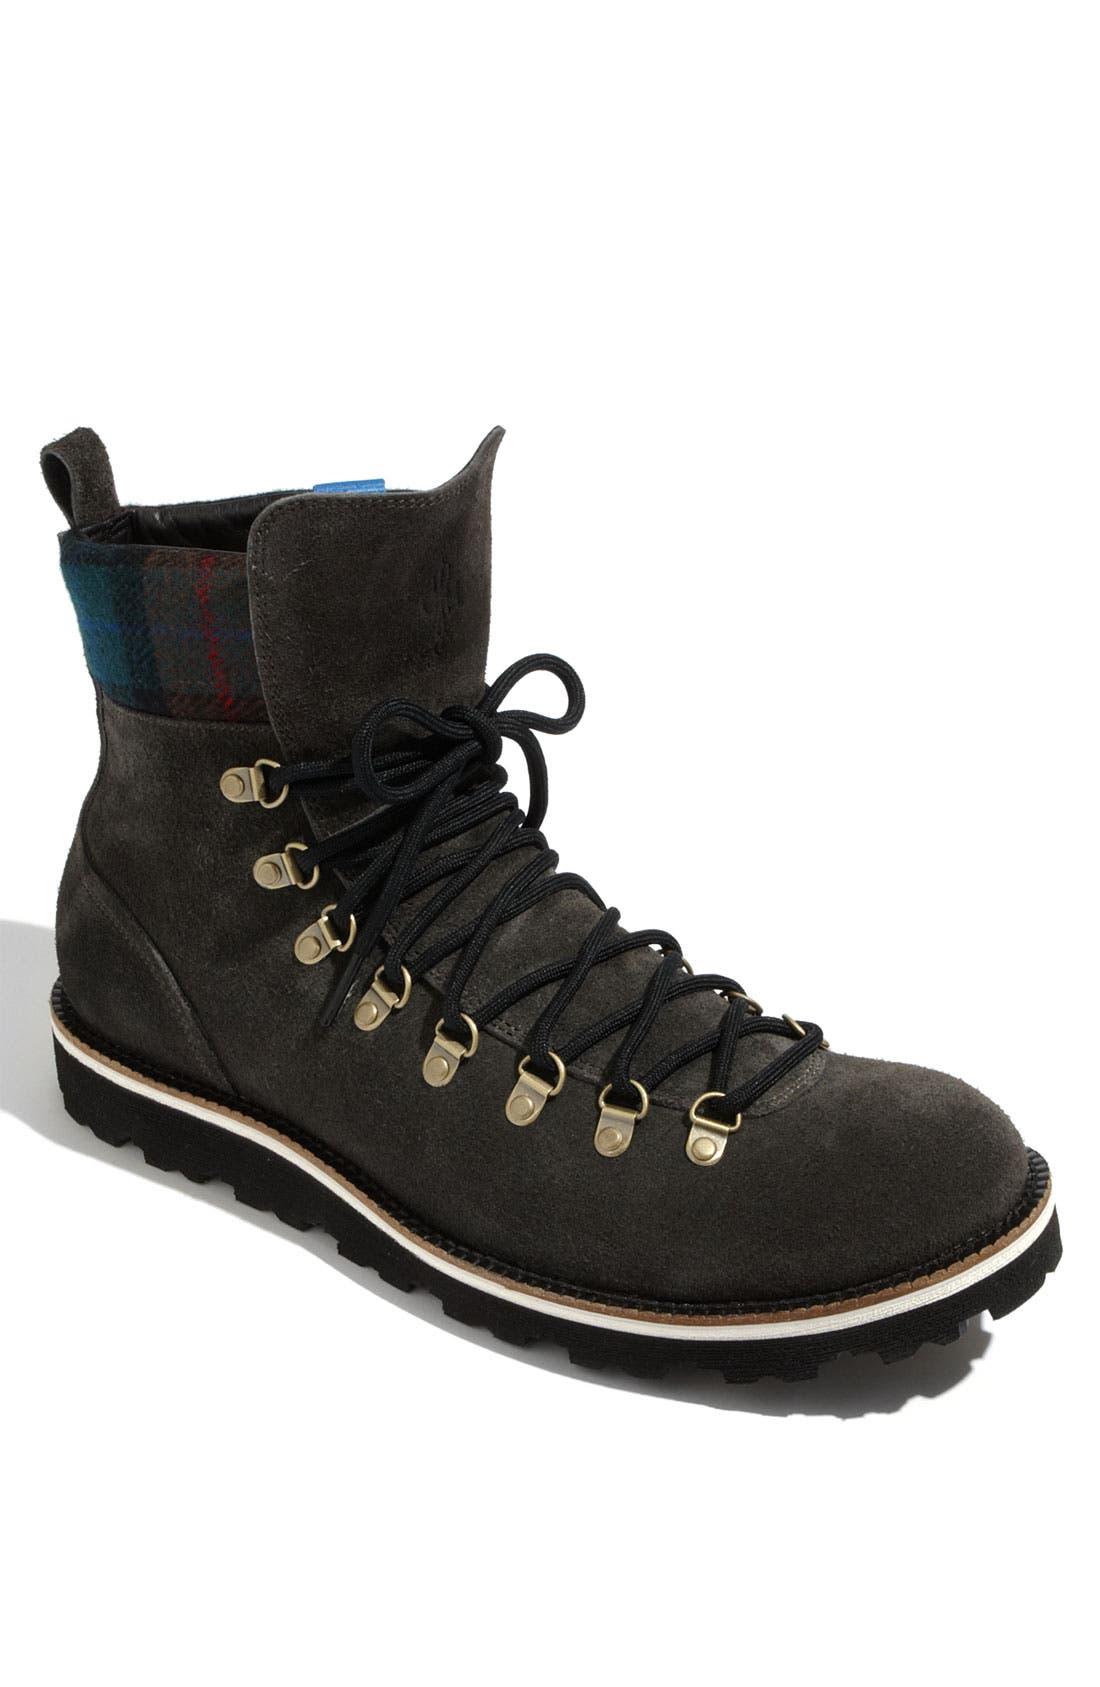 Alternate Image 1 Selected - Cole Haan 'Air Hunter' Hiking Boot (Men)